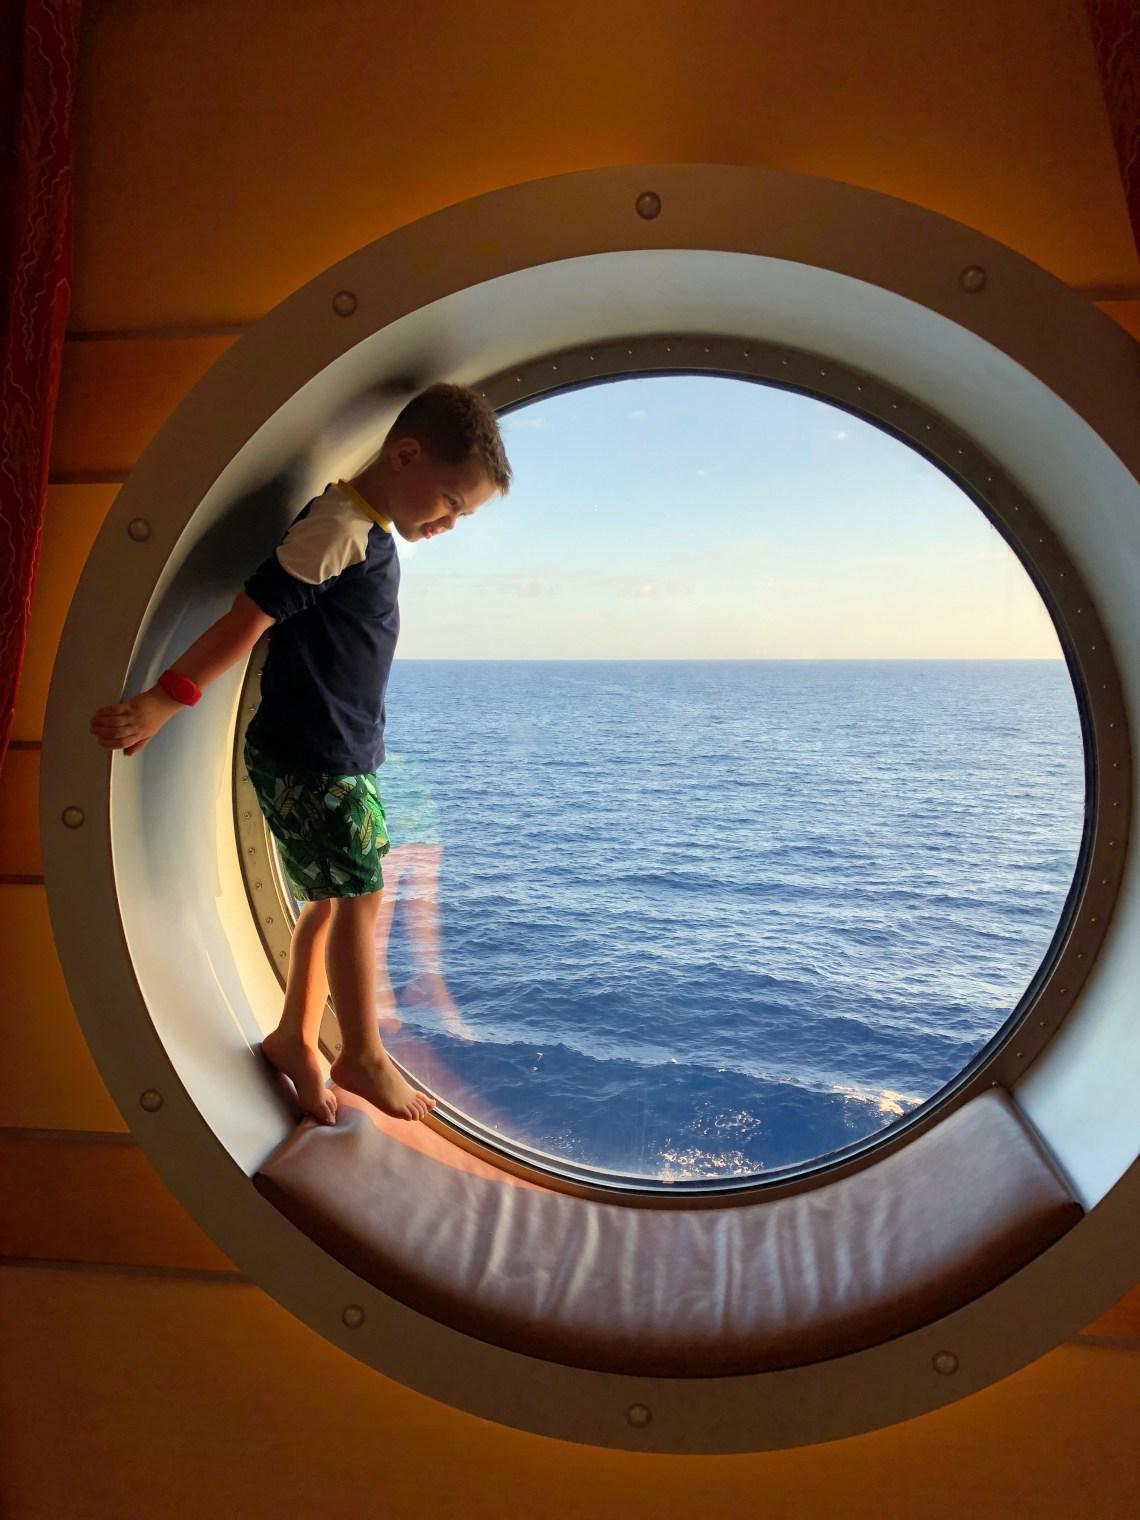 Disney Dream Cruise Ship - Disney Dream Cruise Photos - DisneySMMC Disney Social Media Moms Celebration 2018 via Misty Nelson #disneysmmc #disneymoms